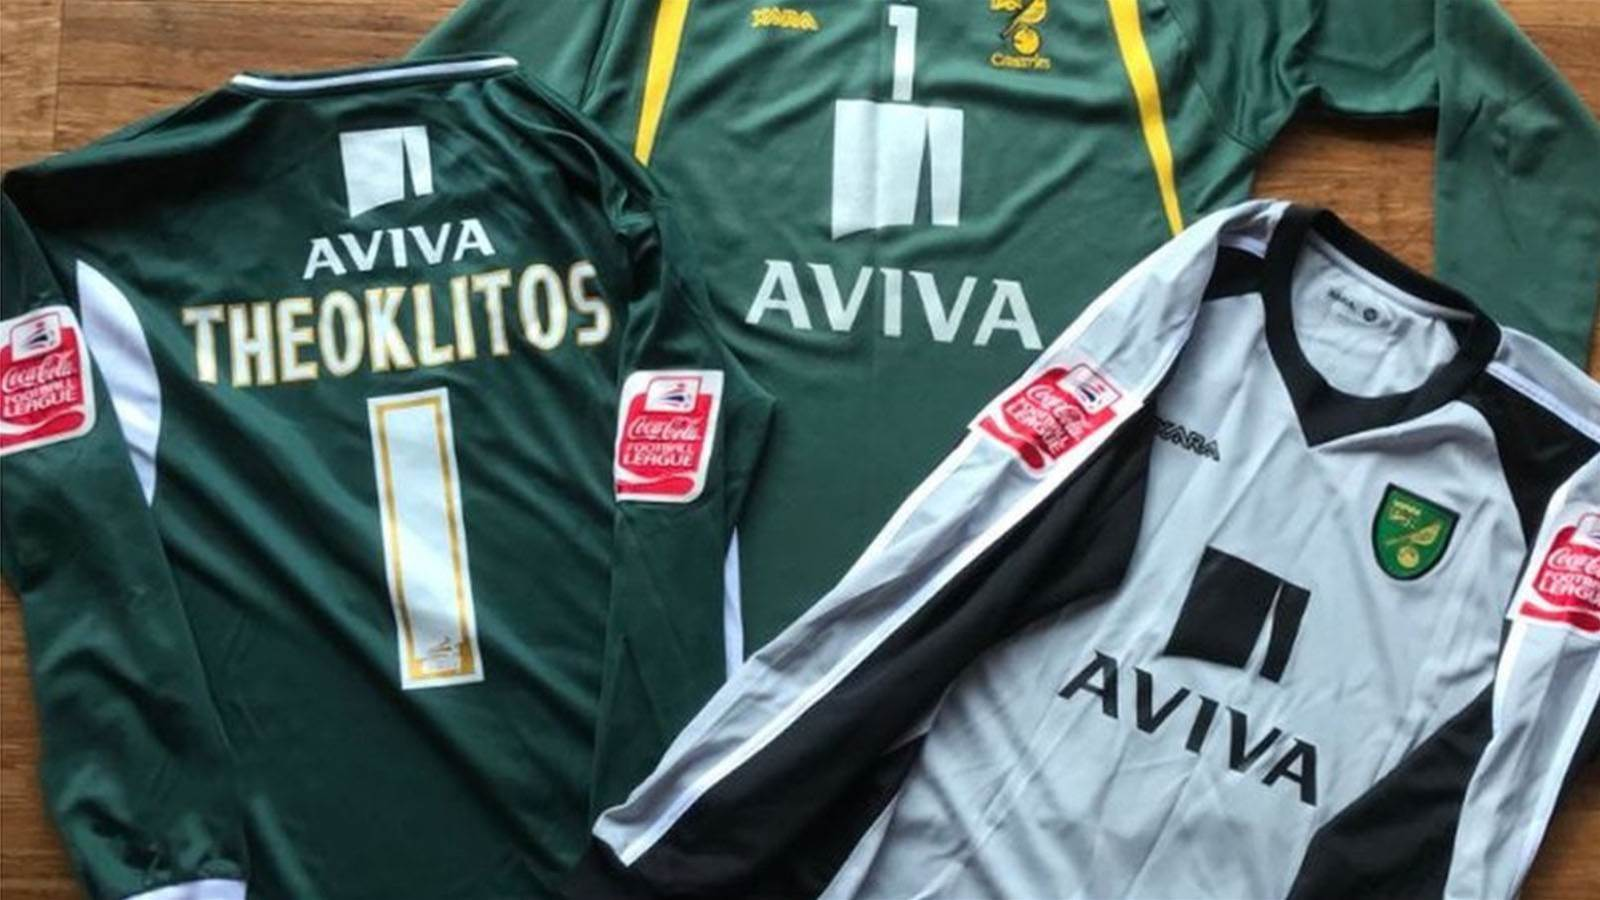 Aussie's notorious Norwich shirts in op shop